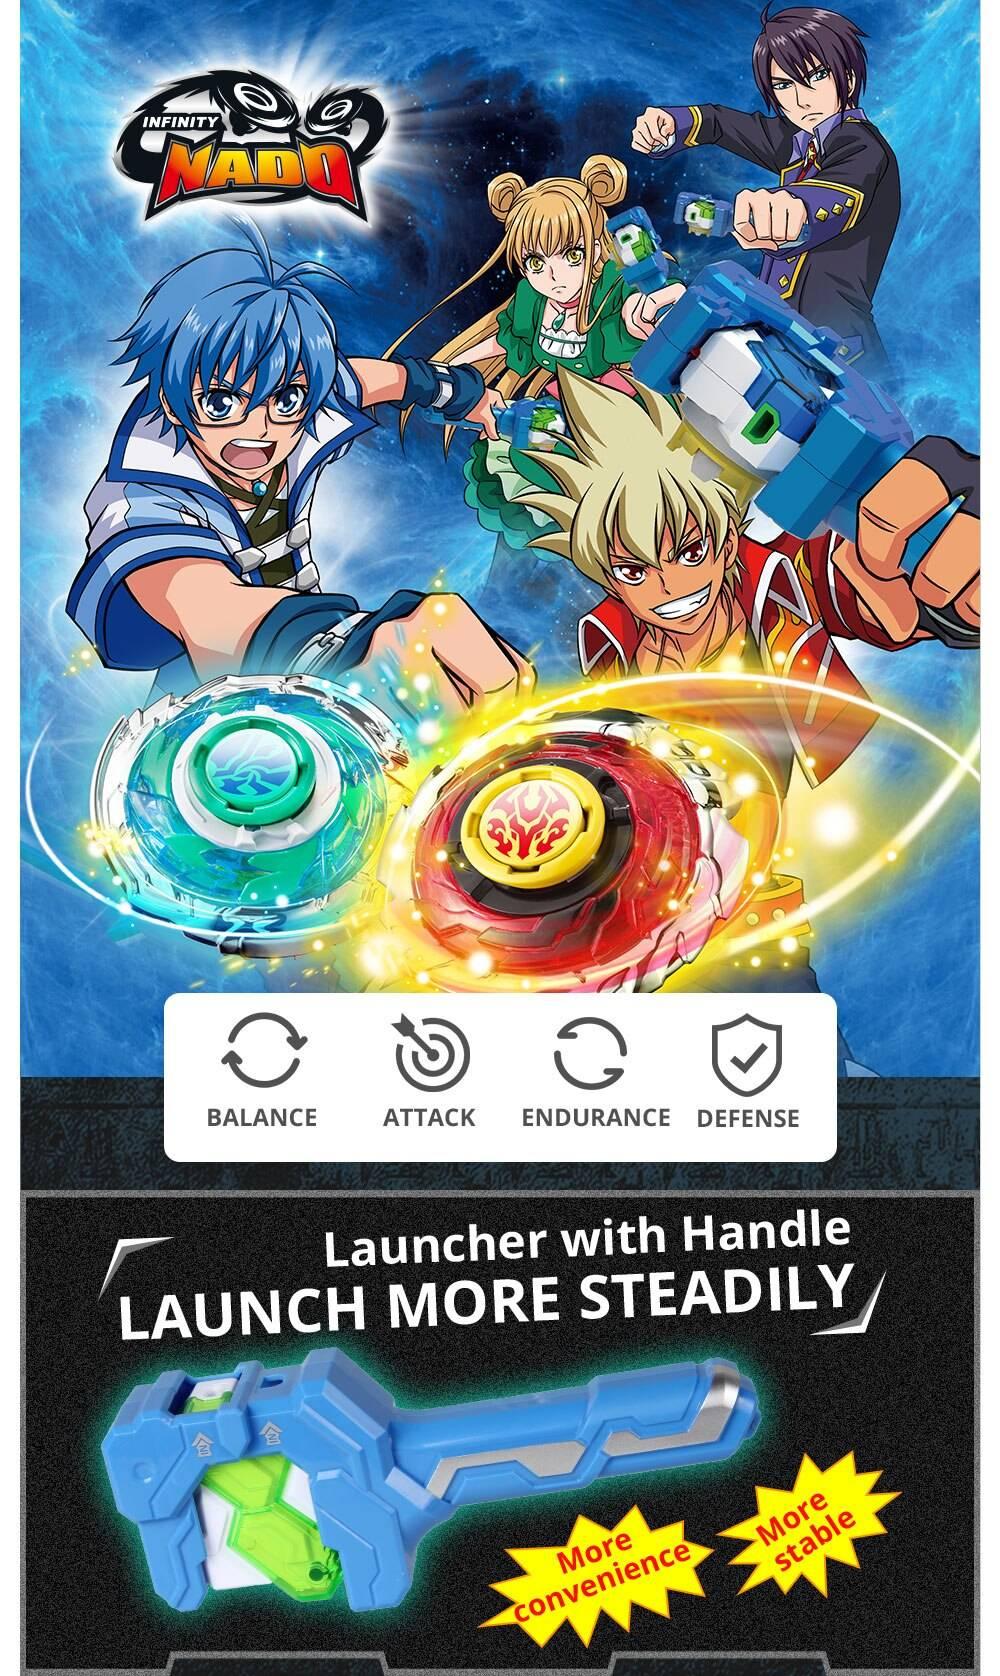 Infinity Nado Athletic Series Beyblade Toy